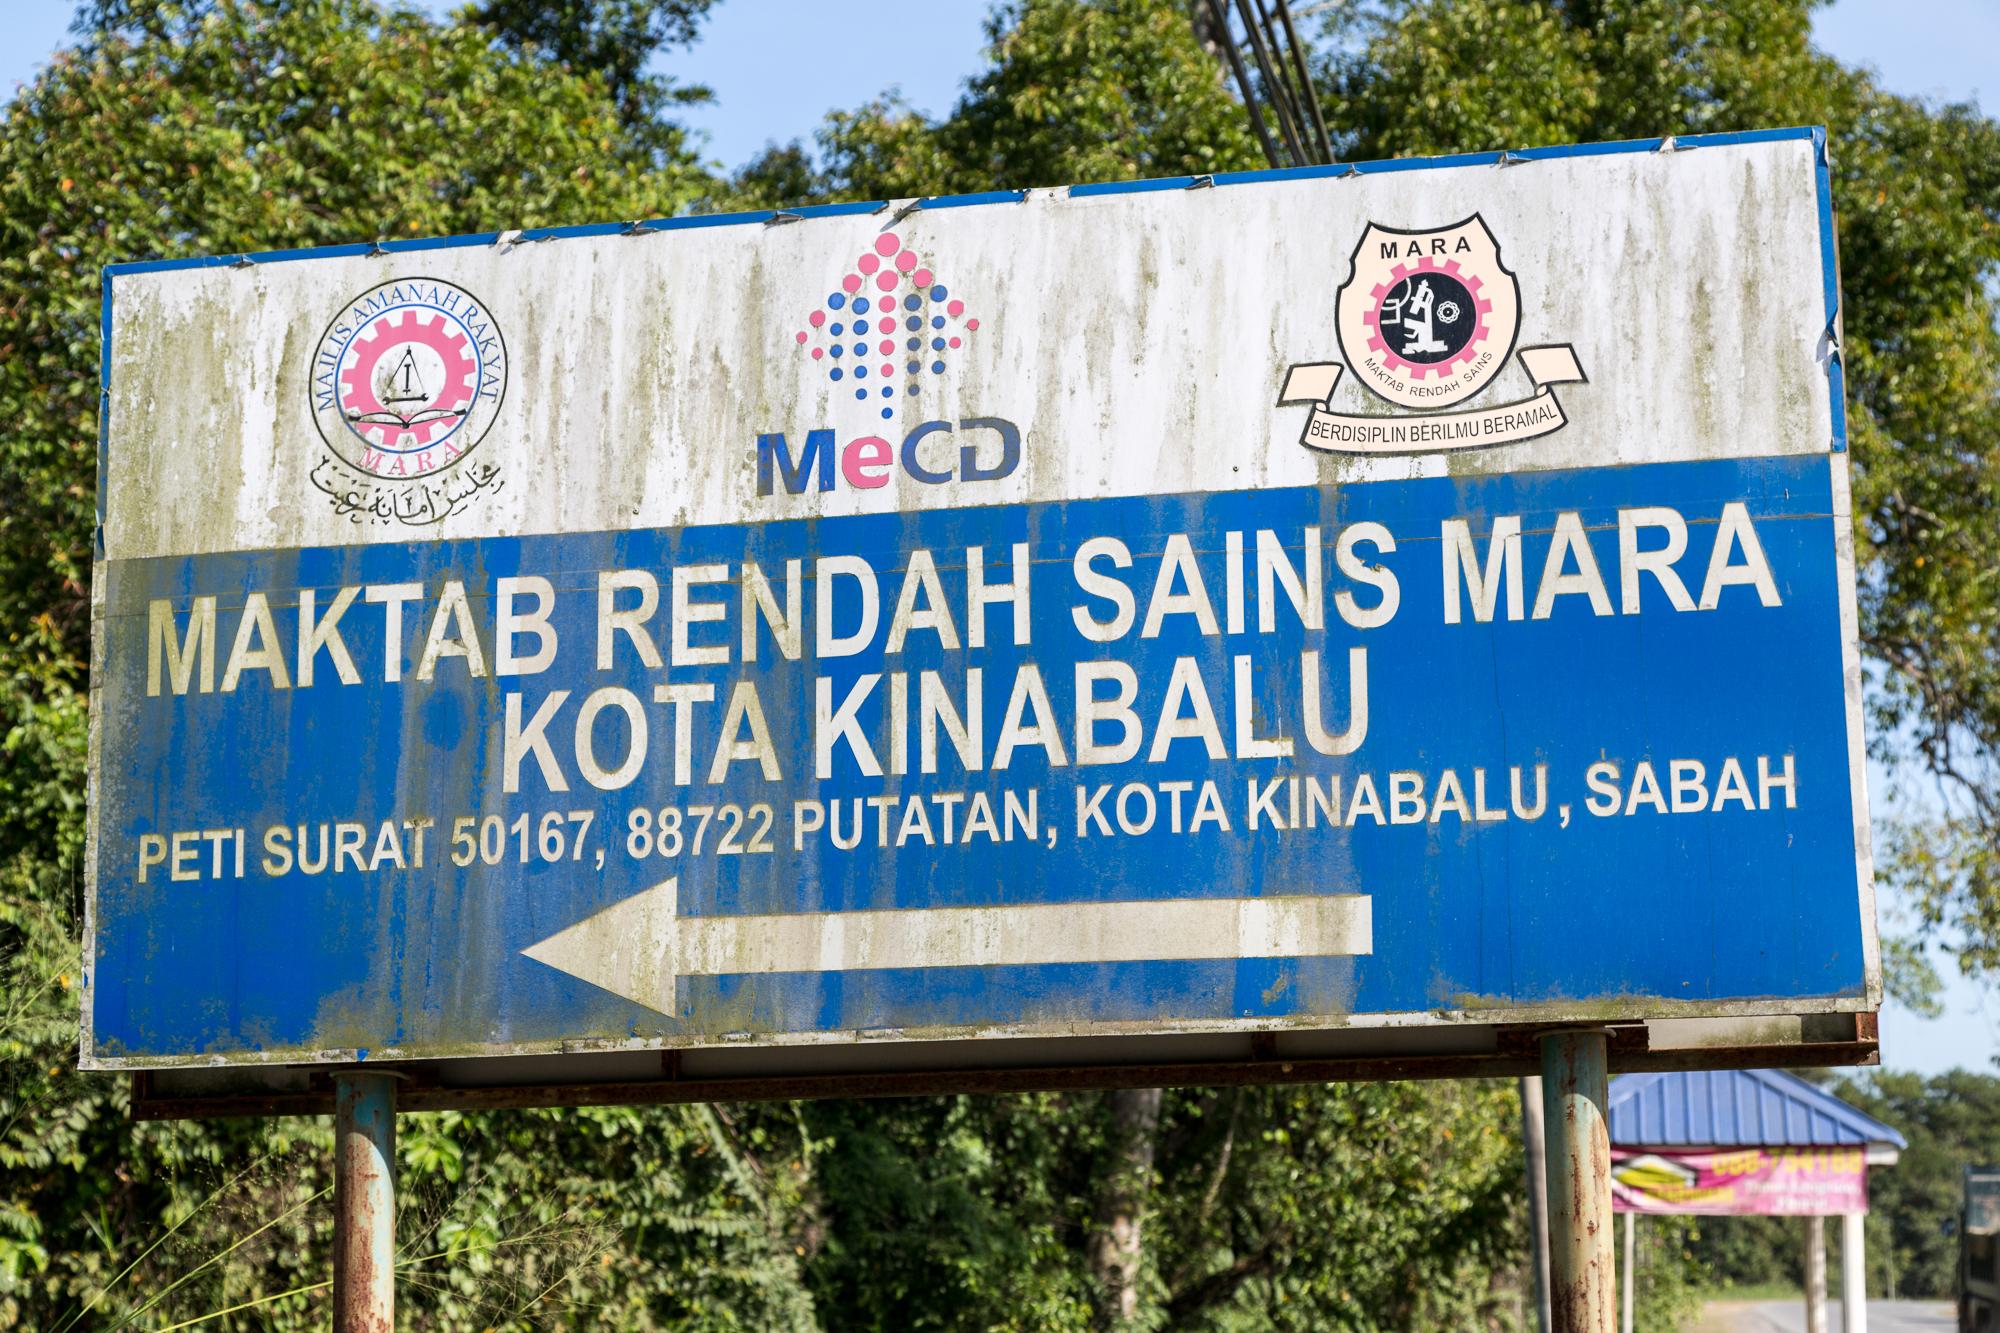 File Putatan Sabah Maktabrendahsainsmara 01 Jpg Wikimedia Commons